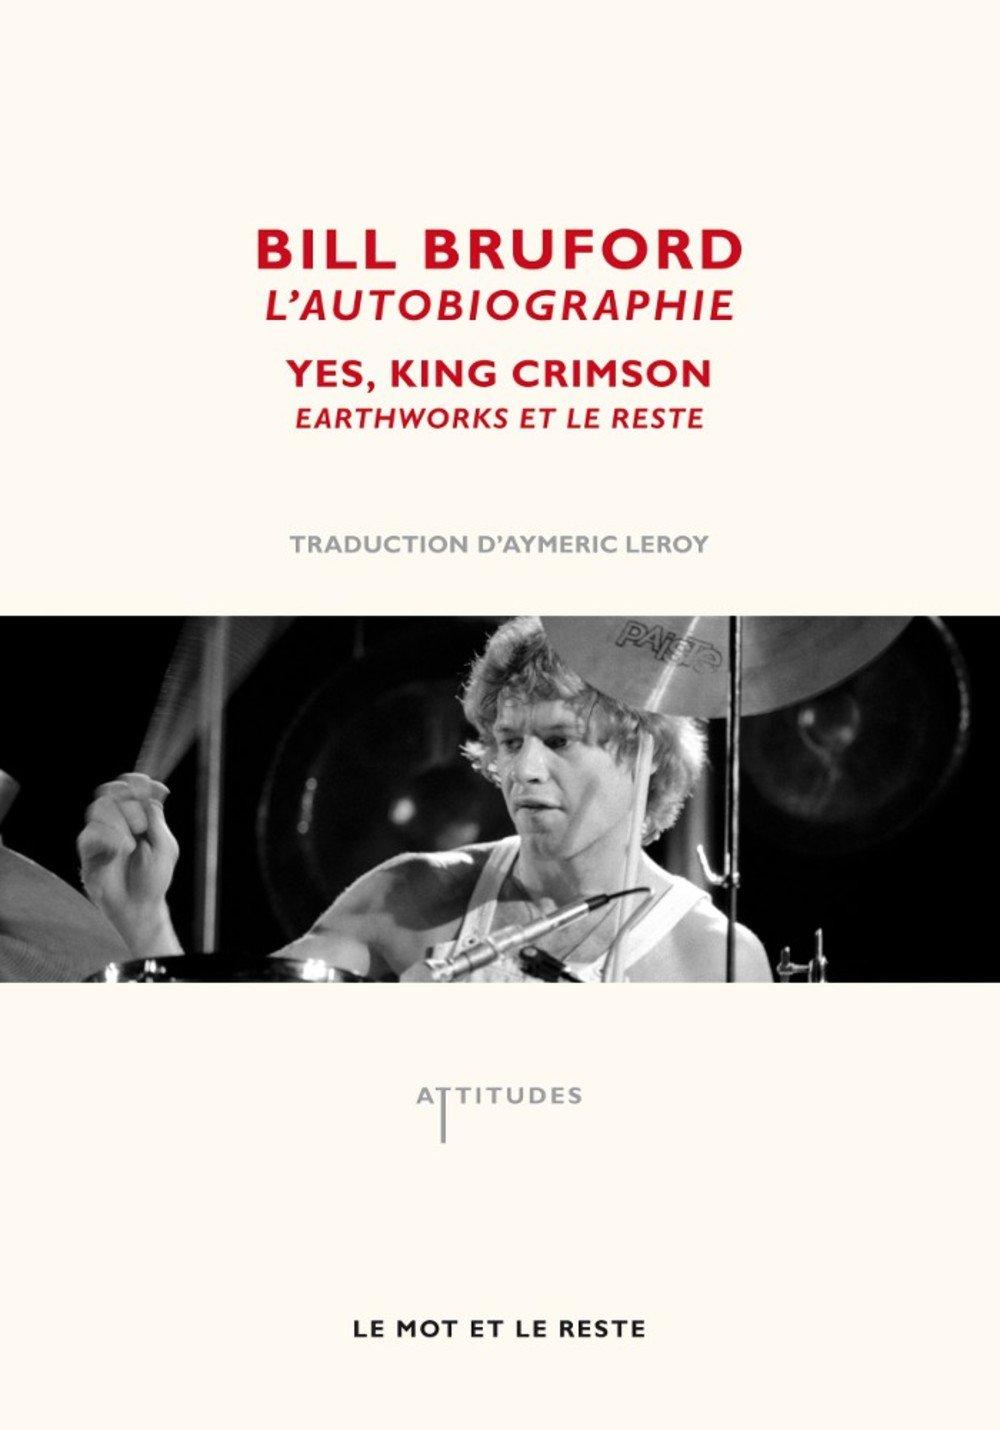 Bill Bruford, l'autobiographie : Yes, King Crimson, Earthworks et le reste por Bill Bruford